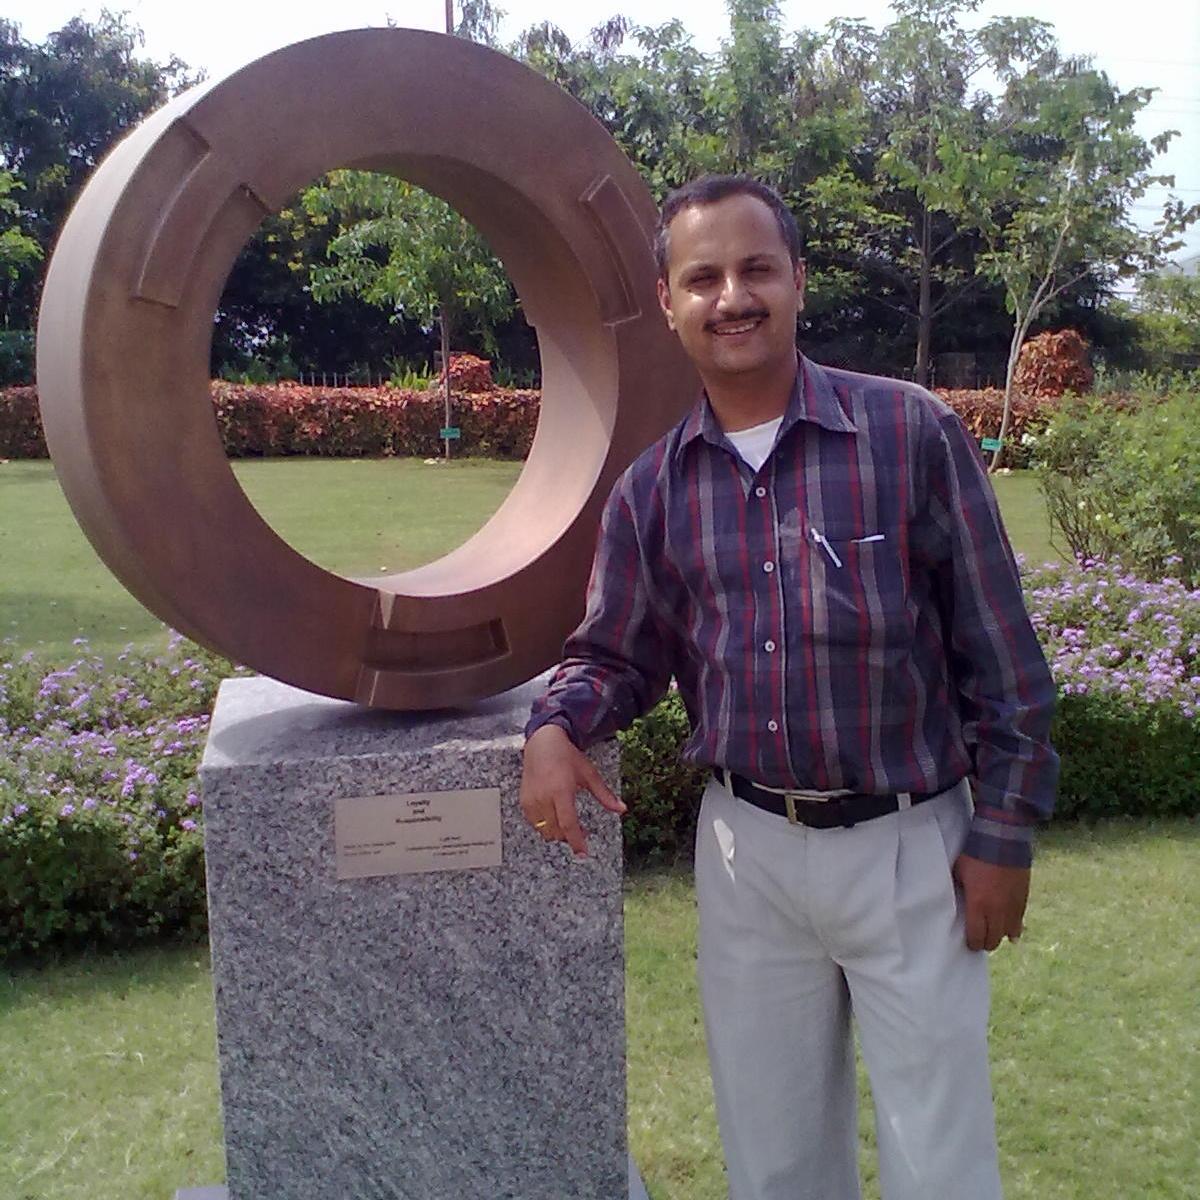 Makarand Vijayanand Pimparkar